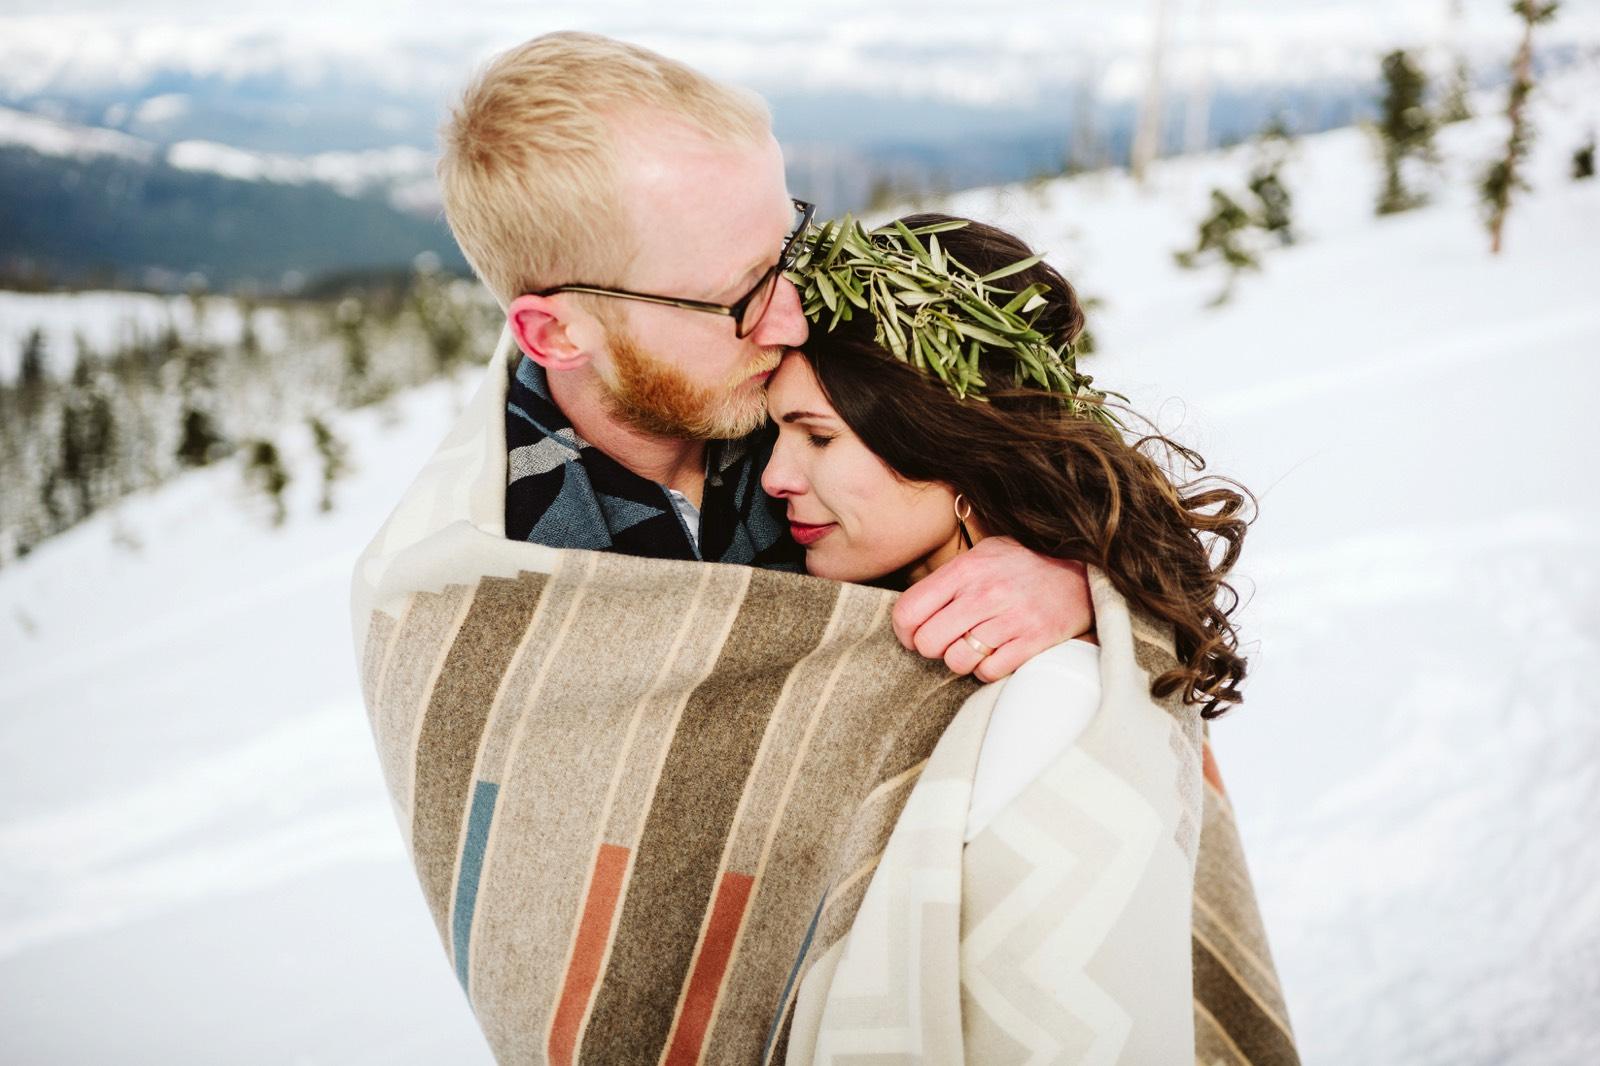 alpine-lakes-high-camp-winter-wedding-55 ALPINE LAKES HIGH CAMP WEDDING